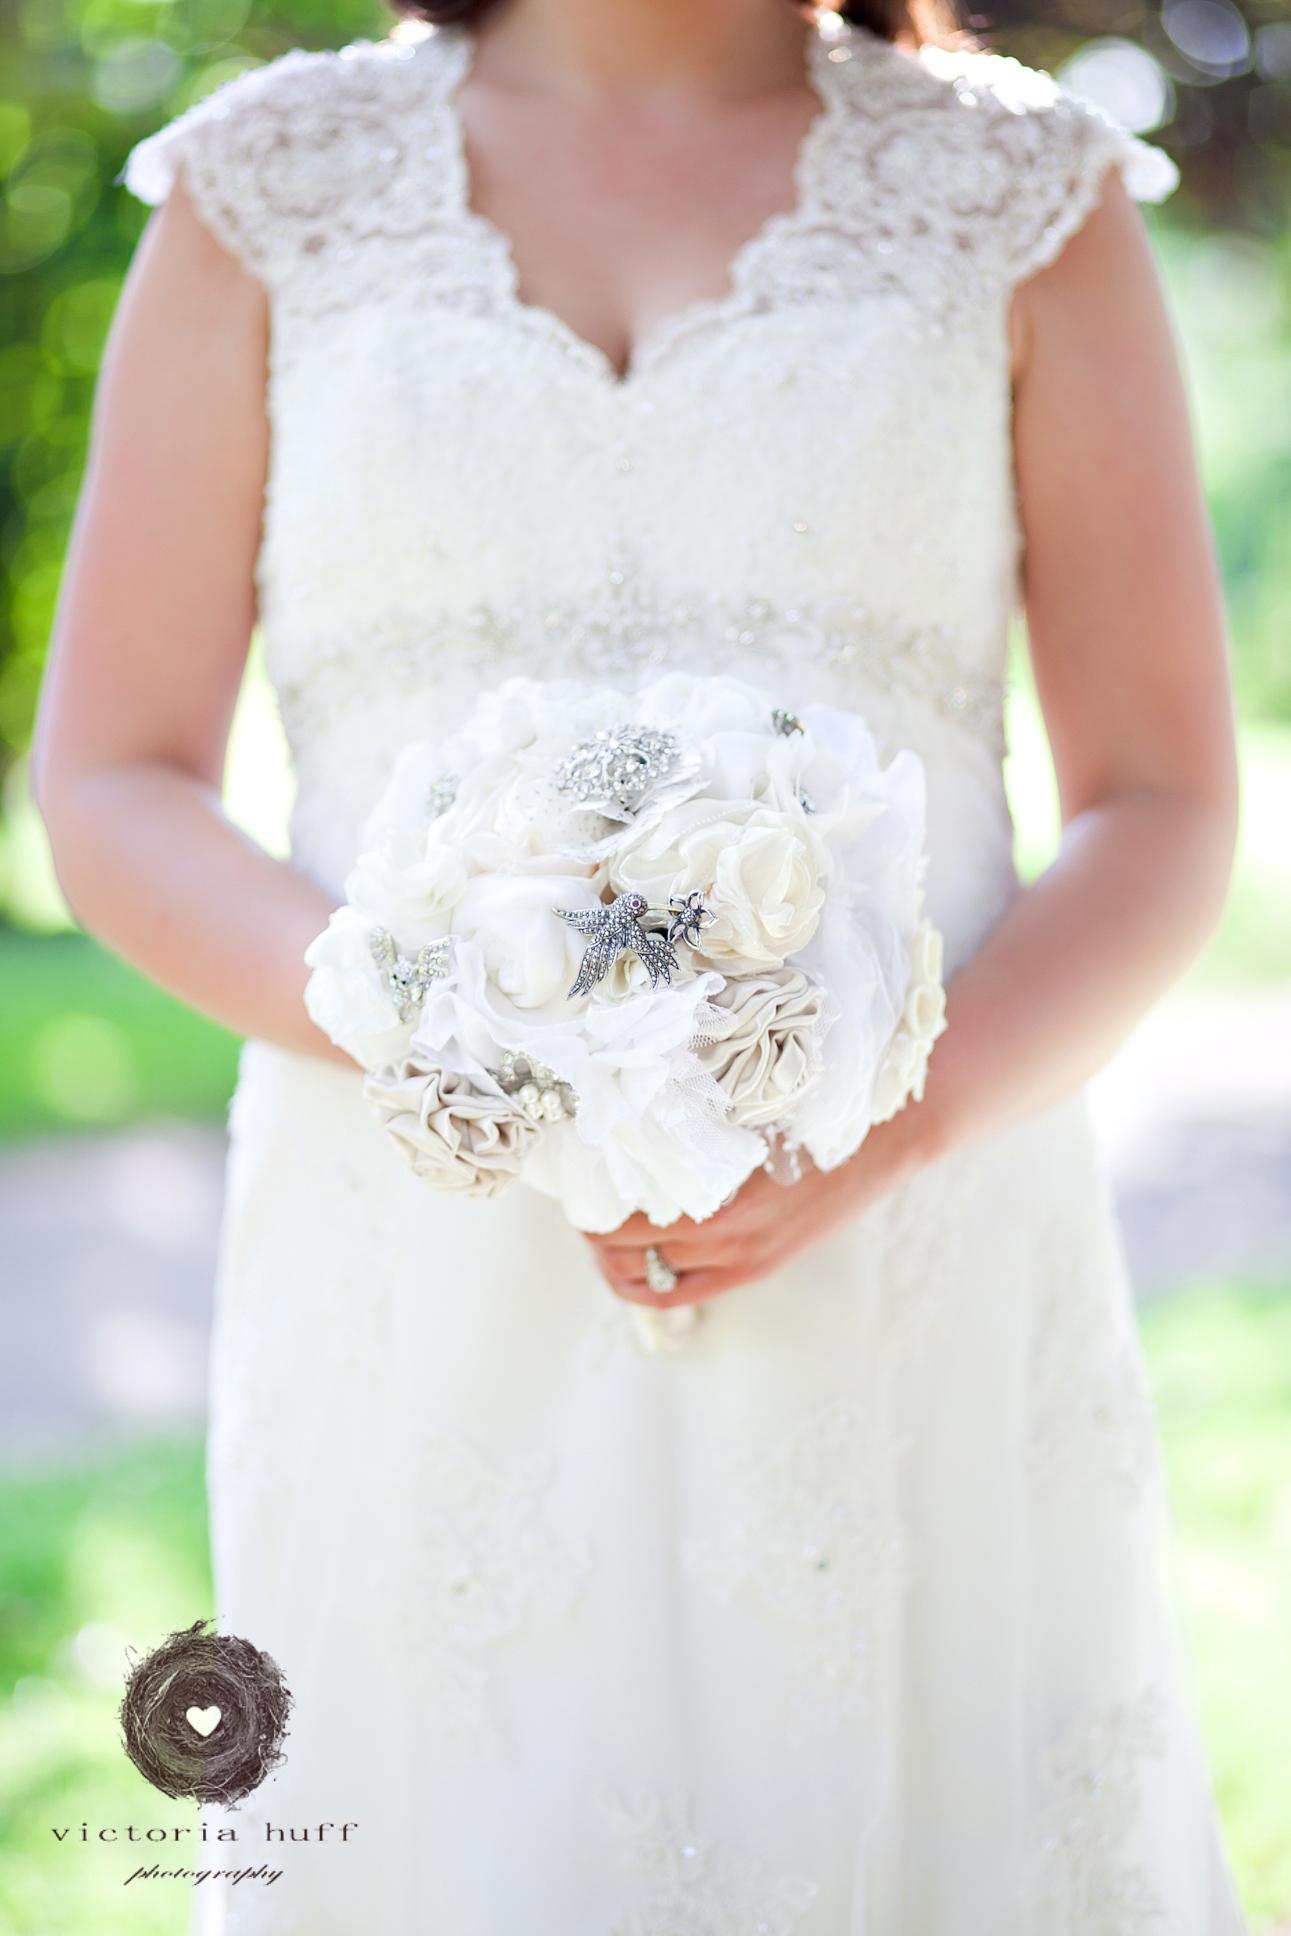 Wedding-Photography-Lindsay-Collins-Jason-Baggett-Wedding-Centennial-Park-Nashville-Tennessee-Hotel-Indigo-Vintage.jpg